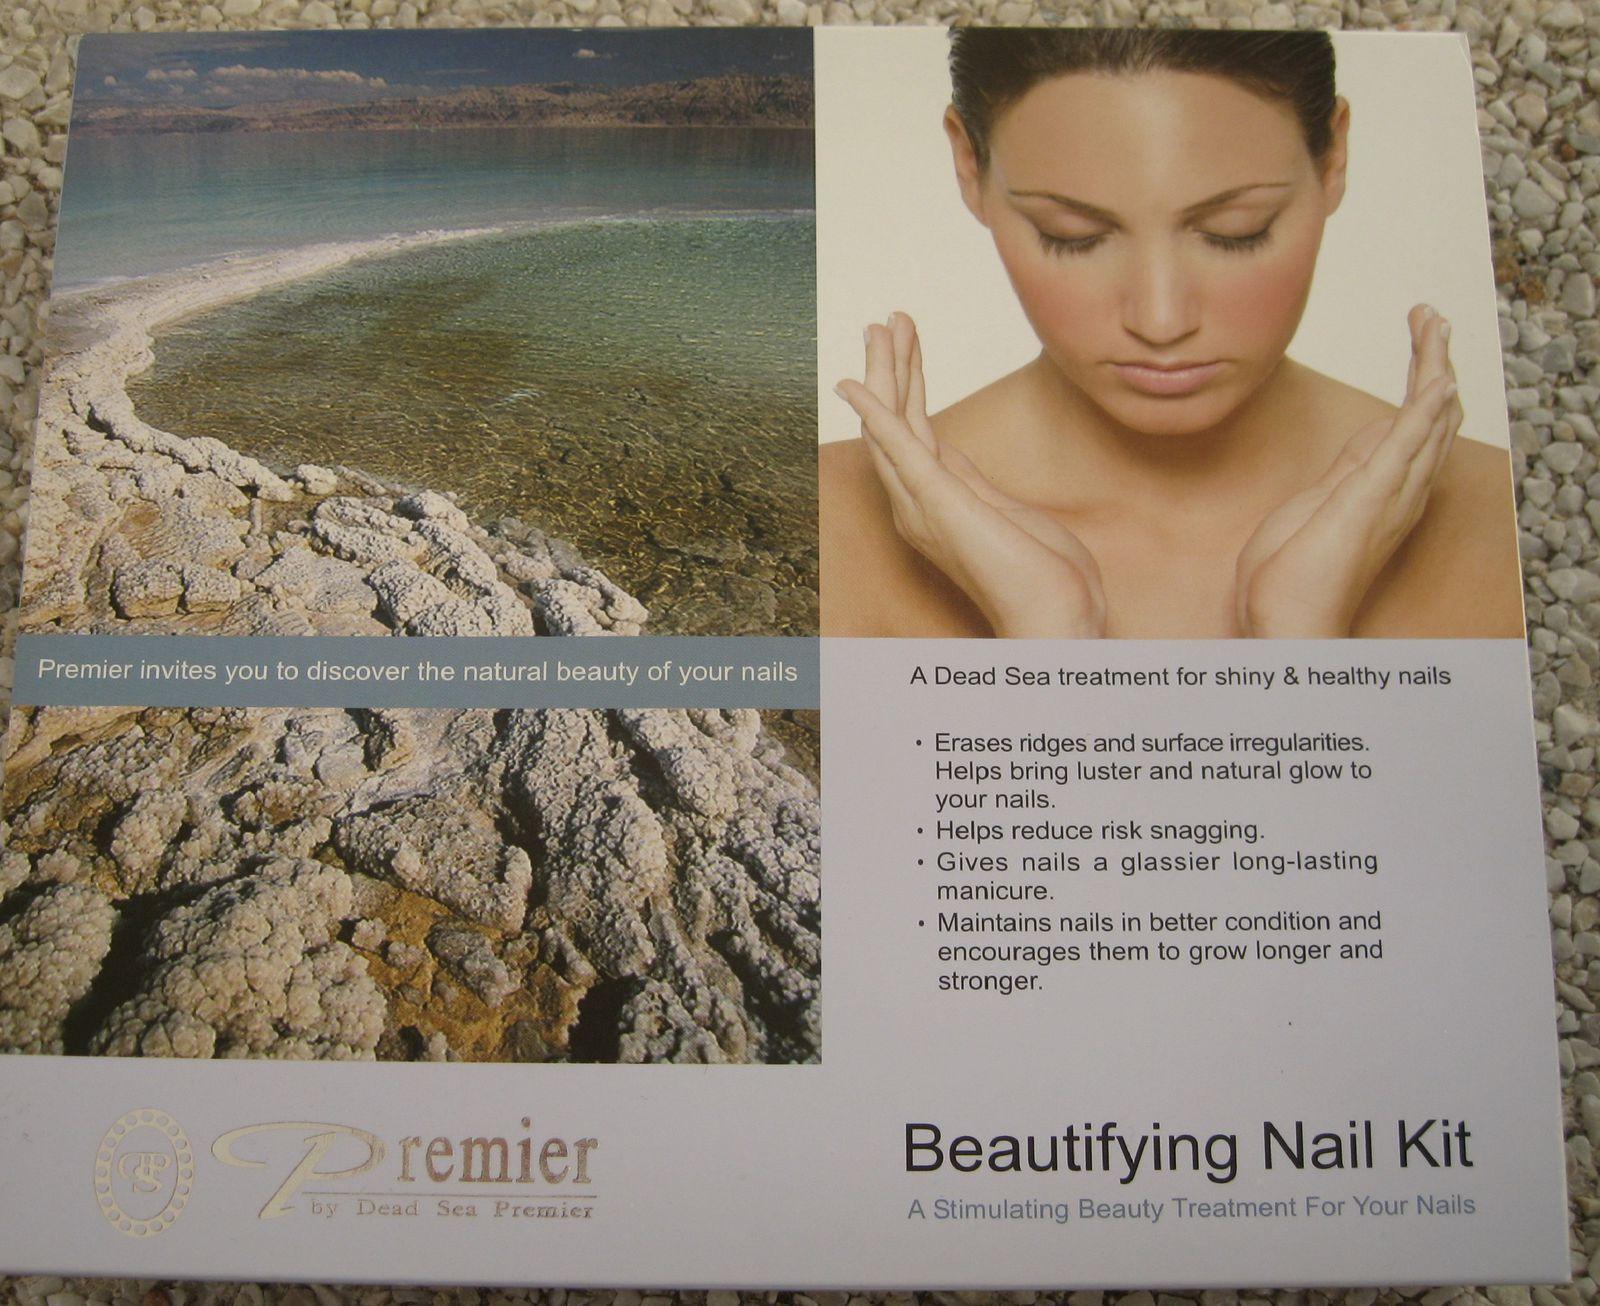 Beautifying Nail Kit by Dead Sea Premier